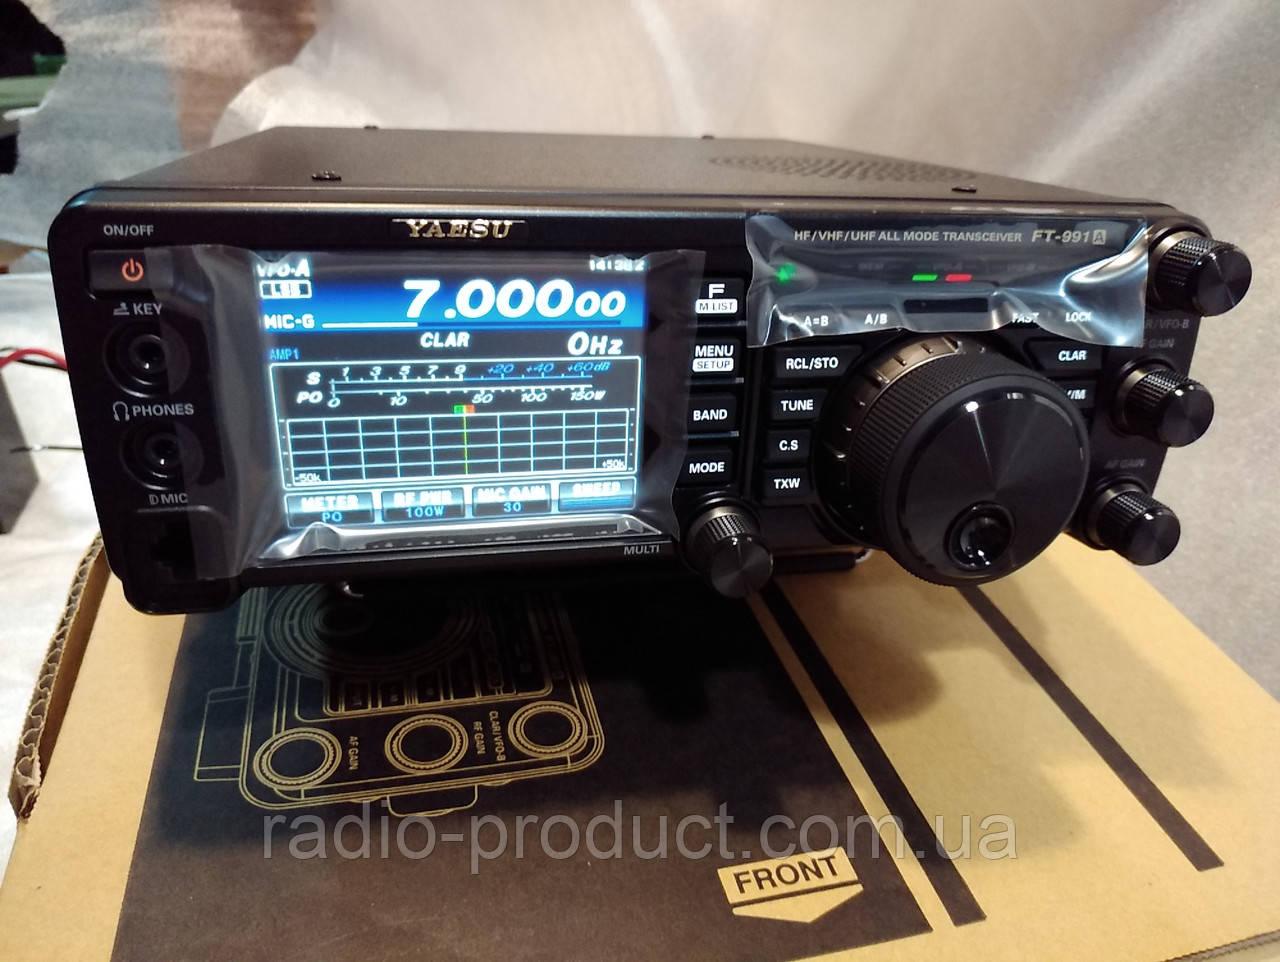 Yaesu FT-991A, КВ+УКВ трансивер, радиостанция